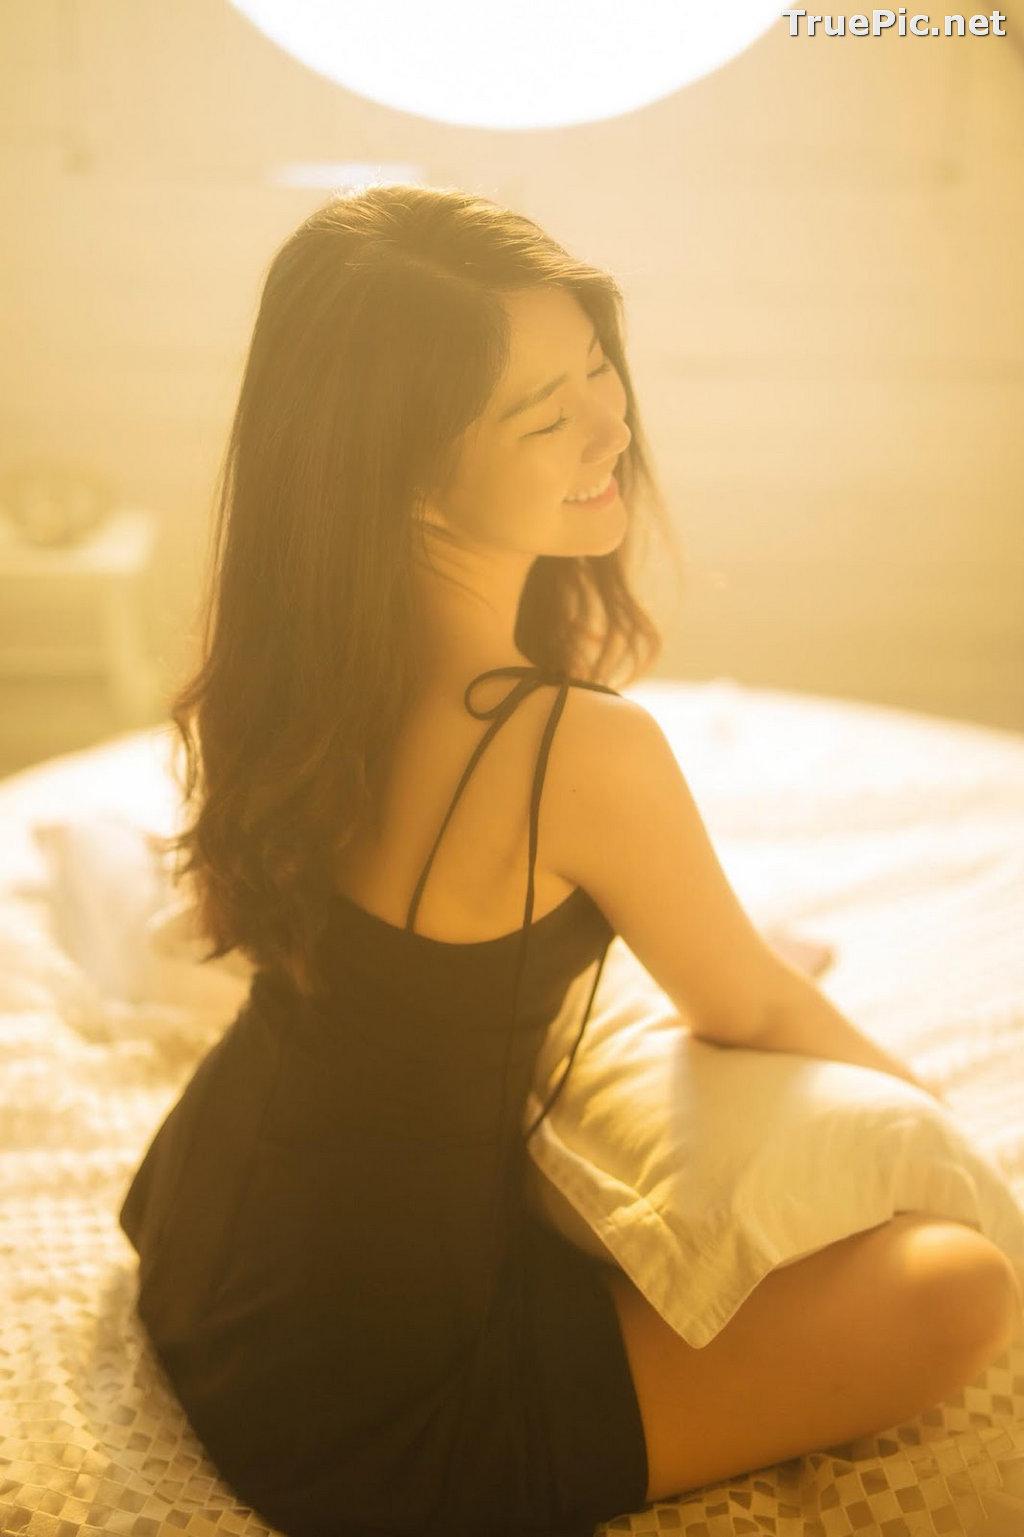 Image Vietnamese Hot Girl - Nguyen Hoang Kieu Trinh - My Black Angel - TruePic.net - Picture-21